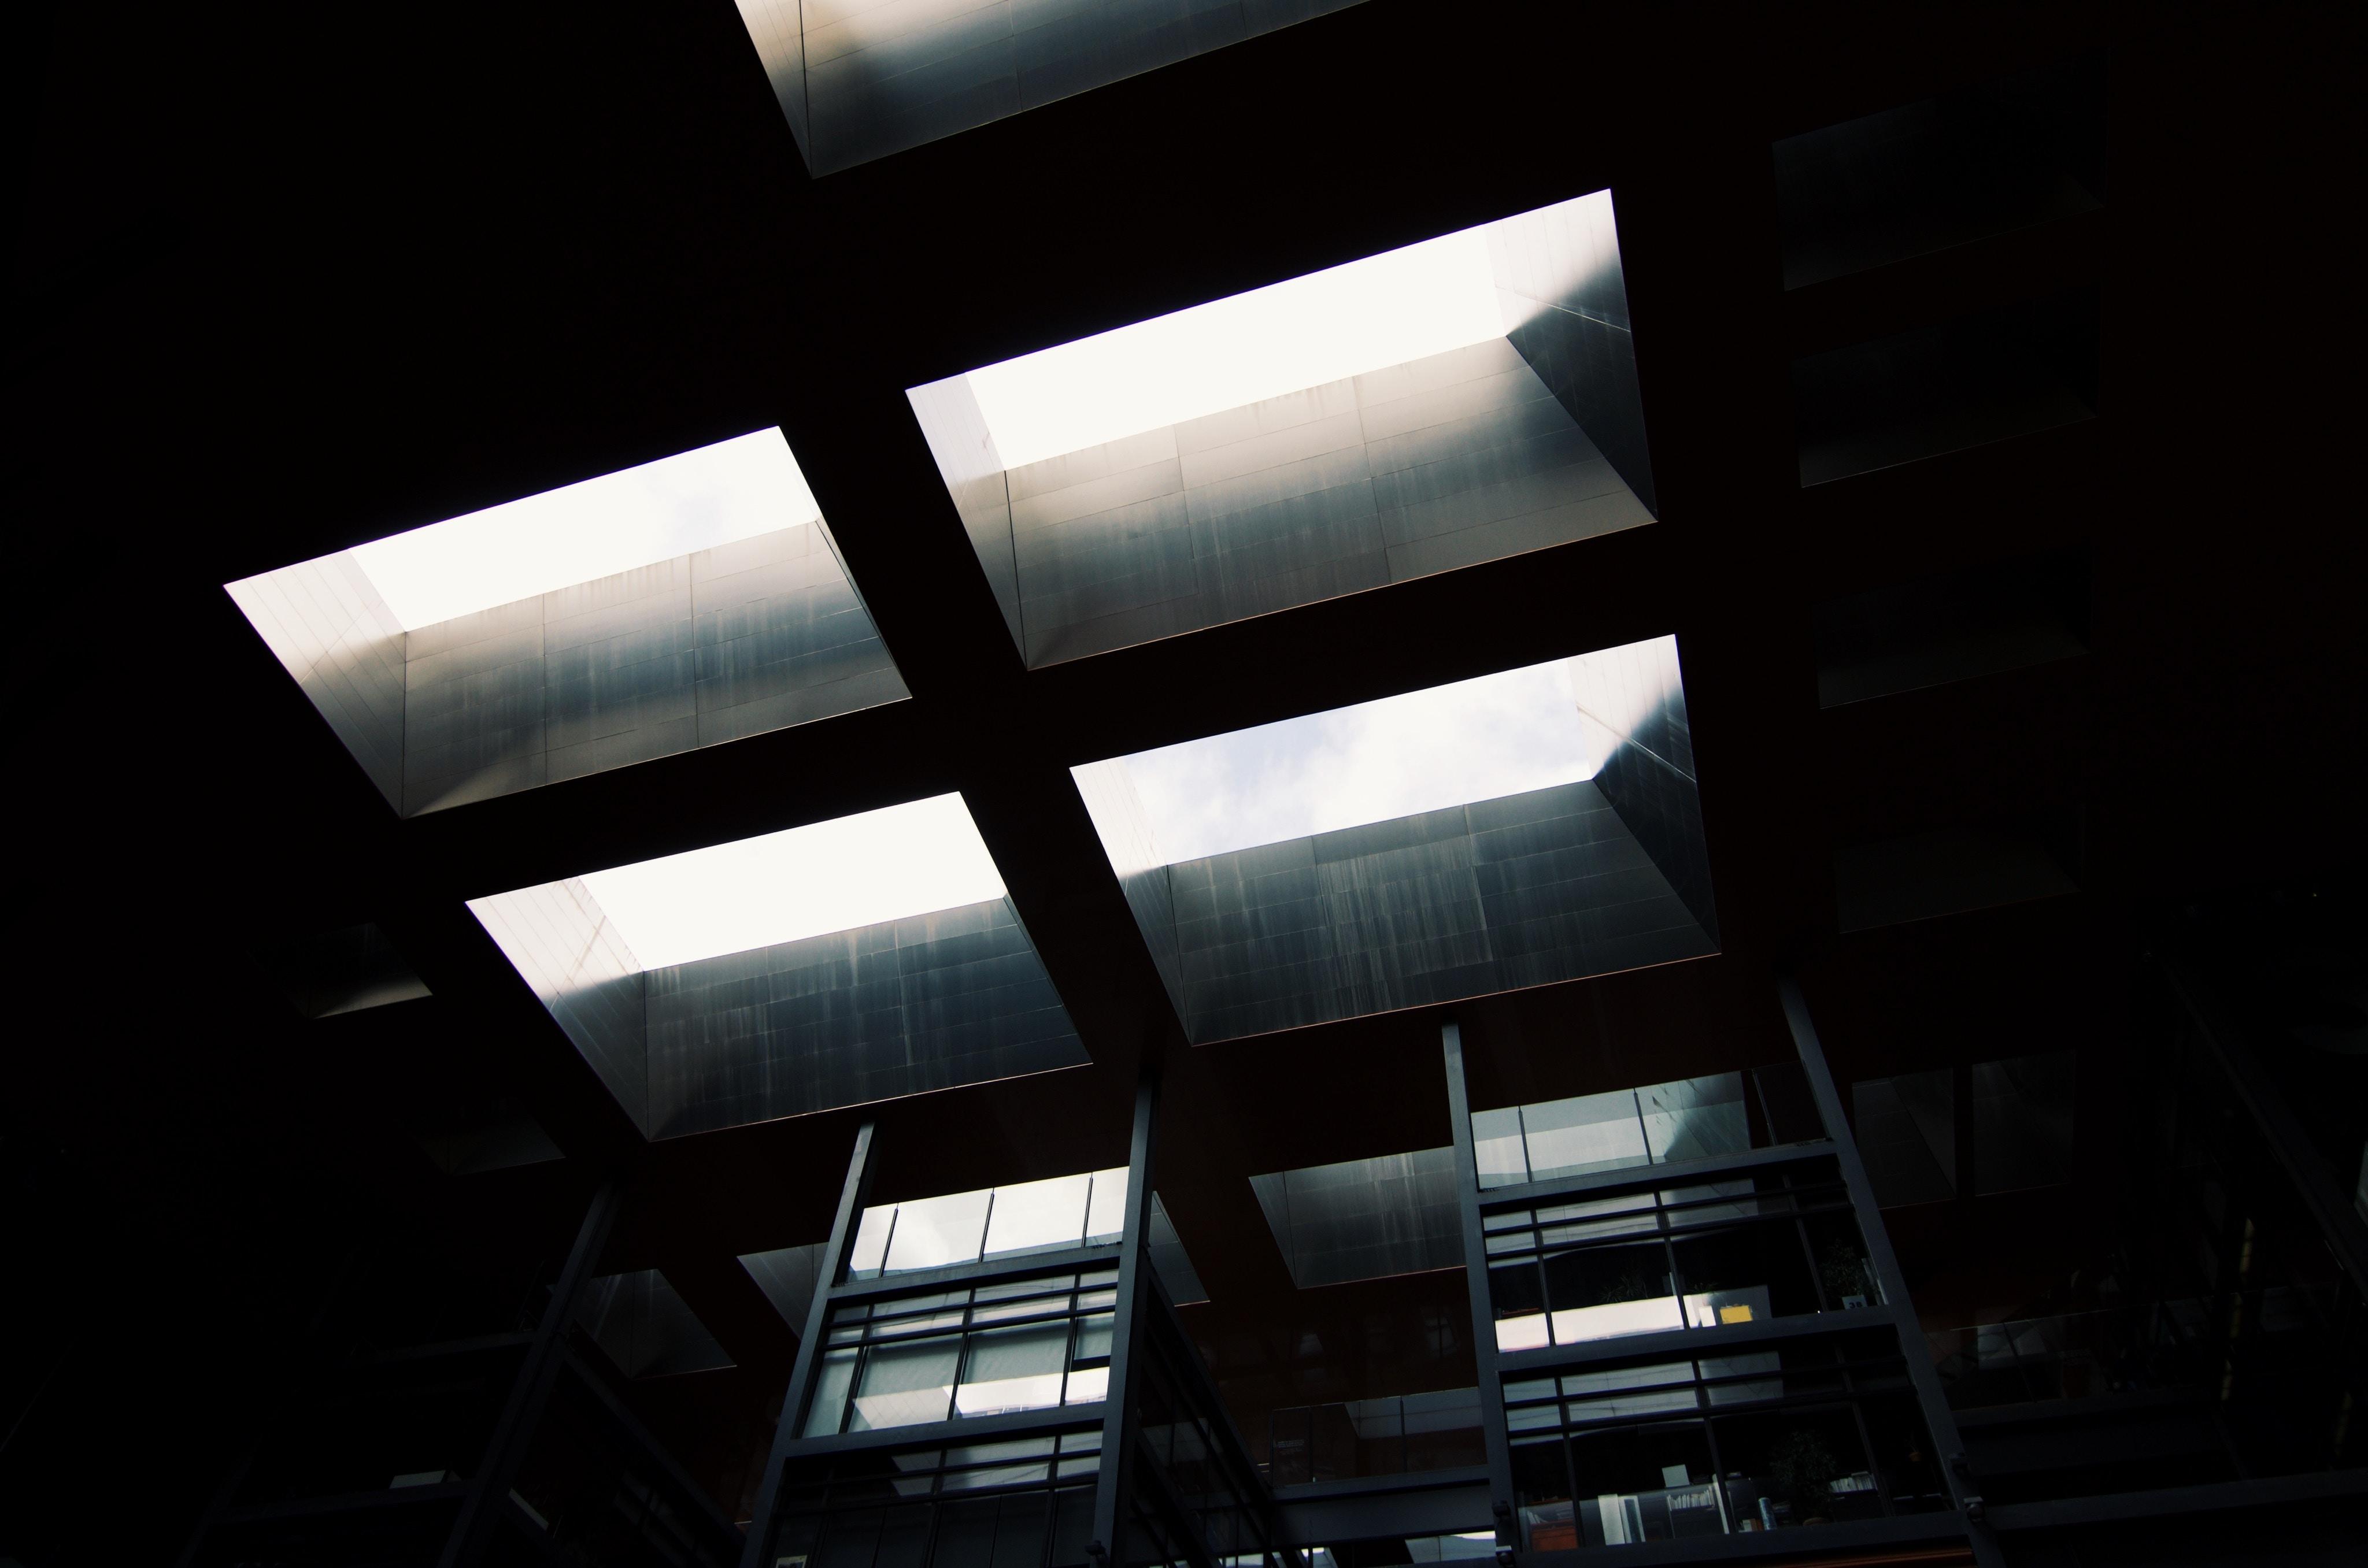 Skylight window from below in dark industrial room at Museo Nacional Centro de Arte Reina Sofía